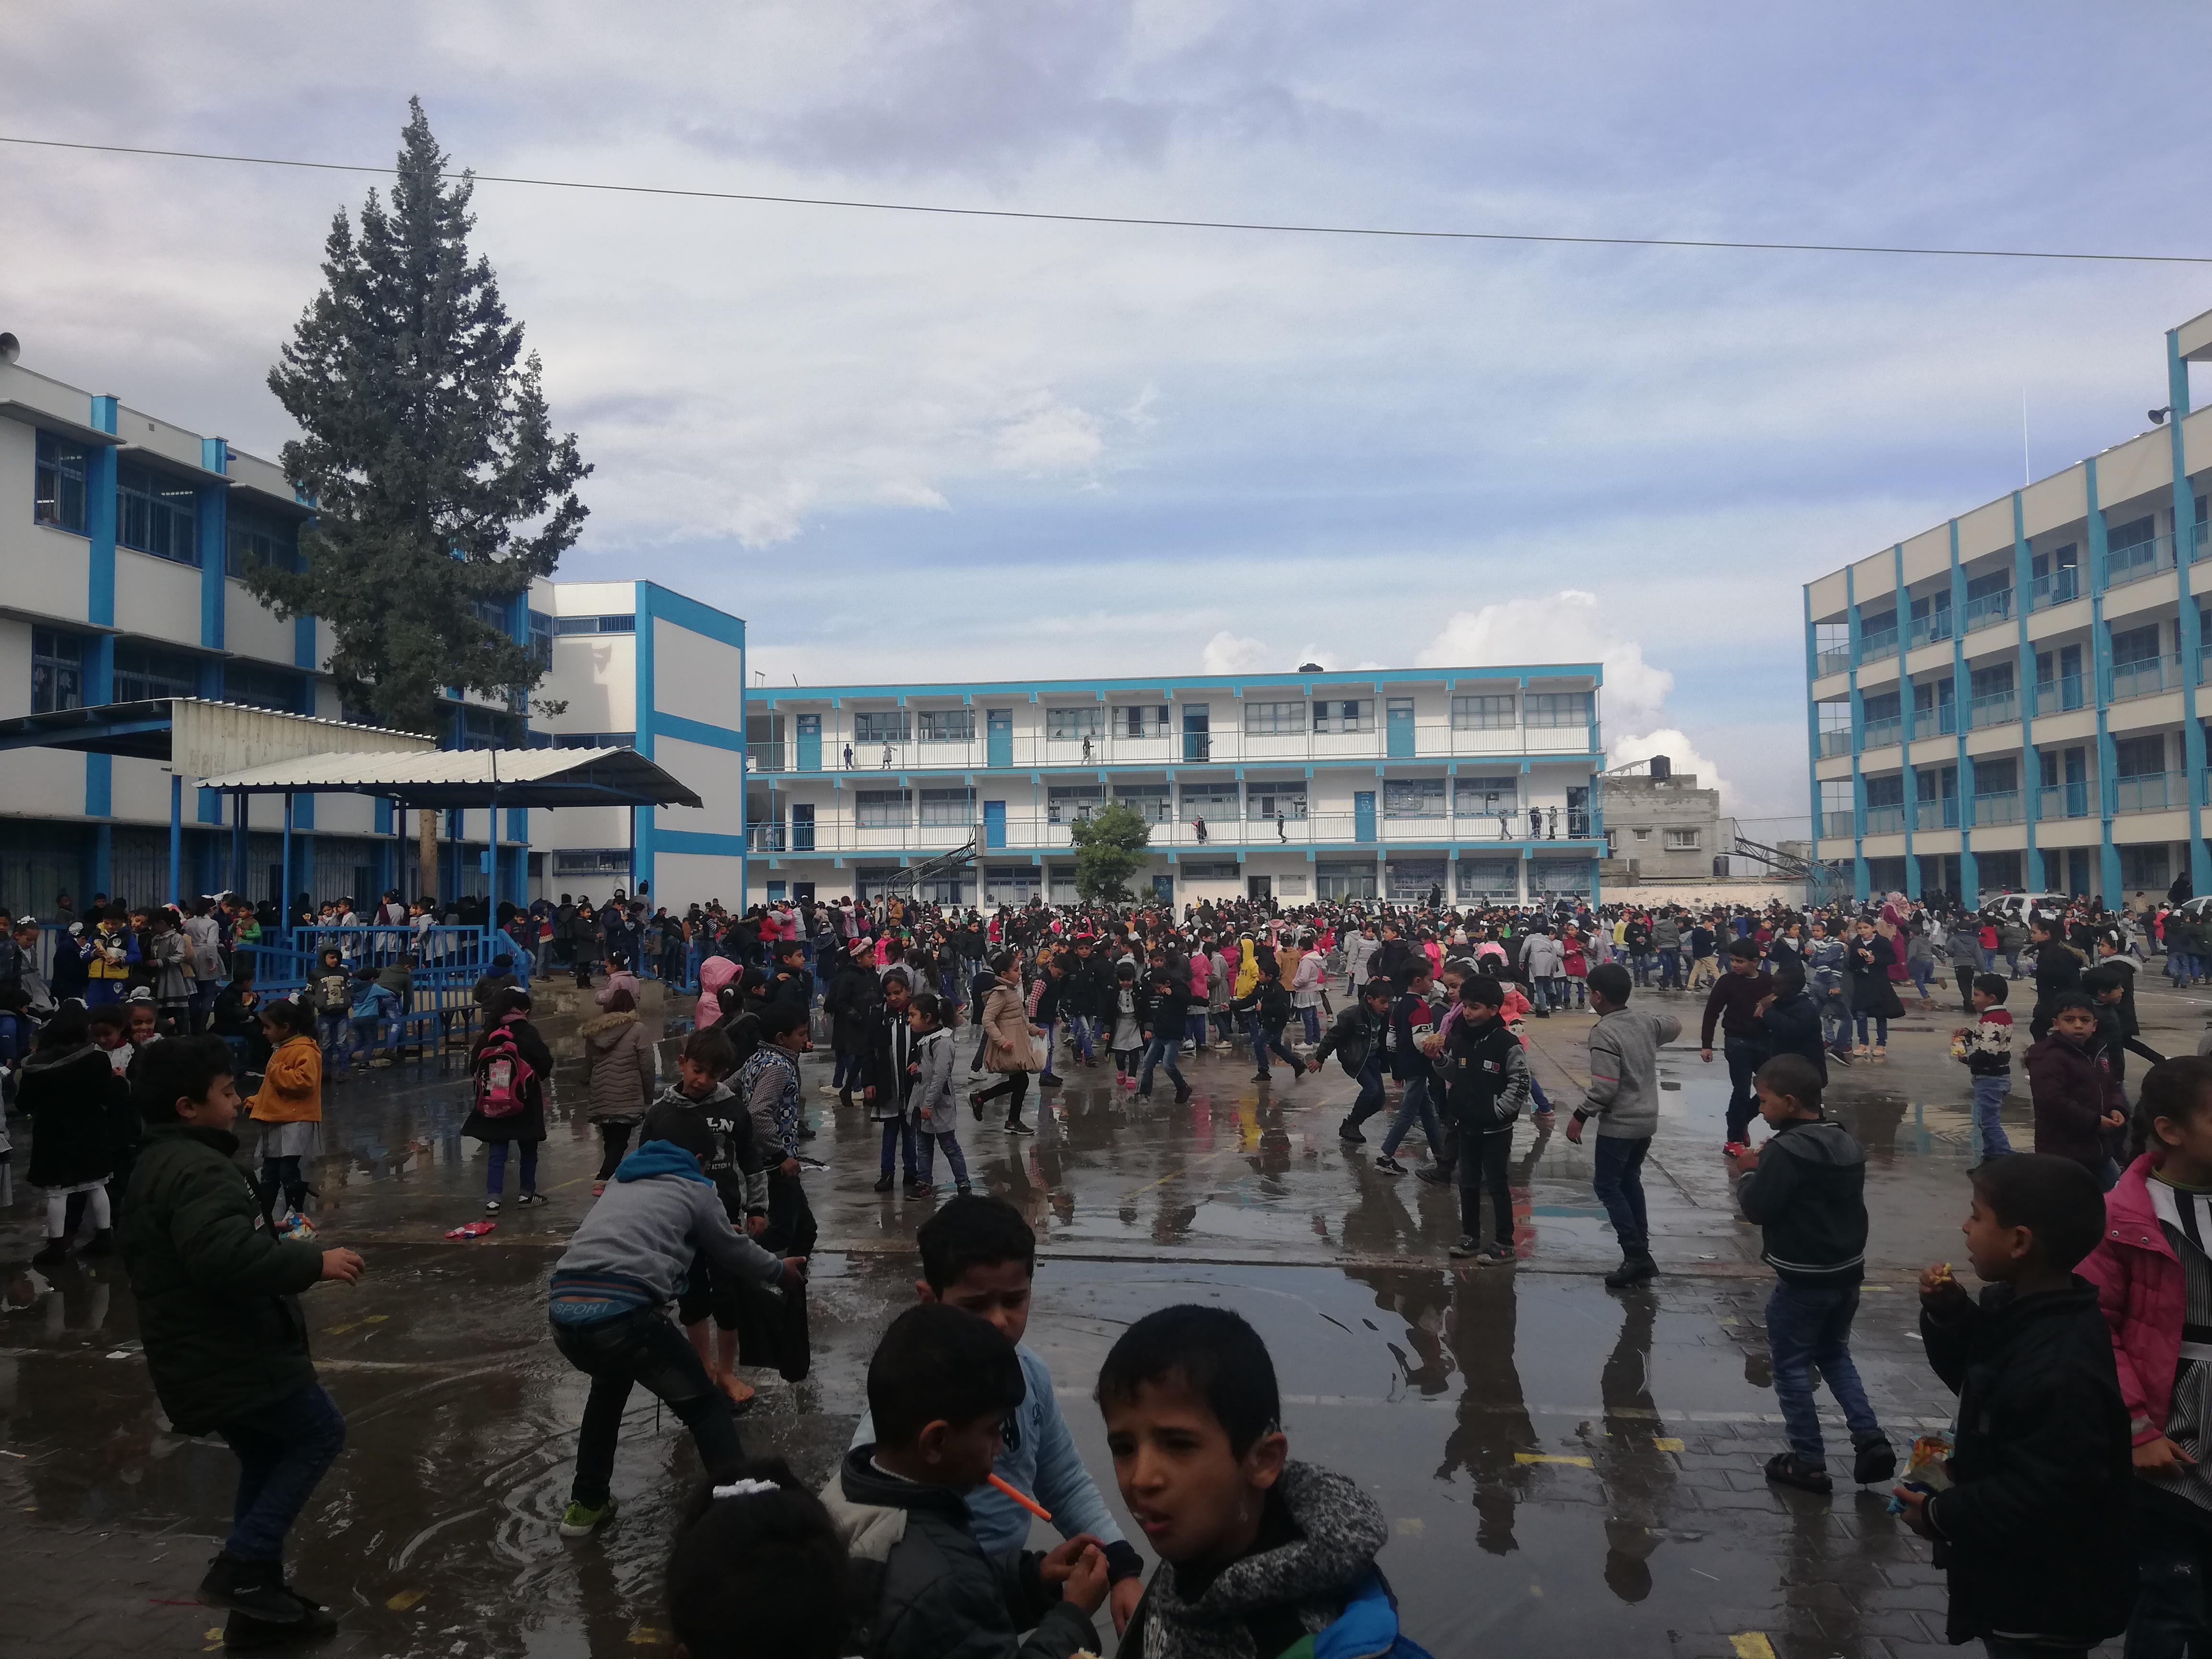 School Yard 1